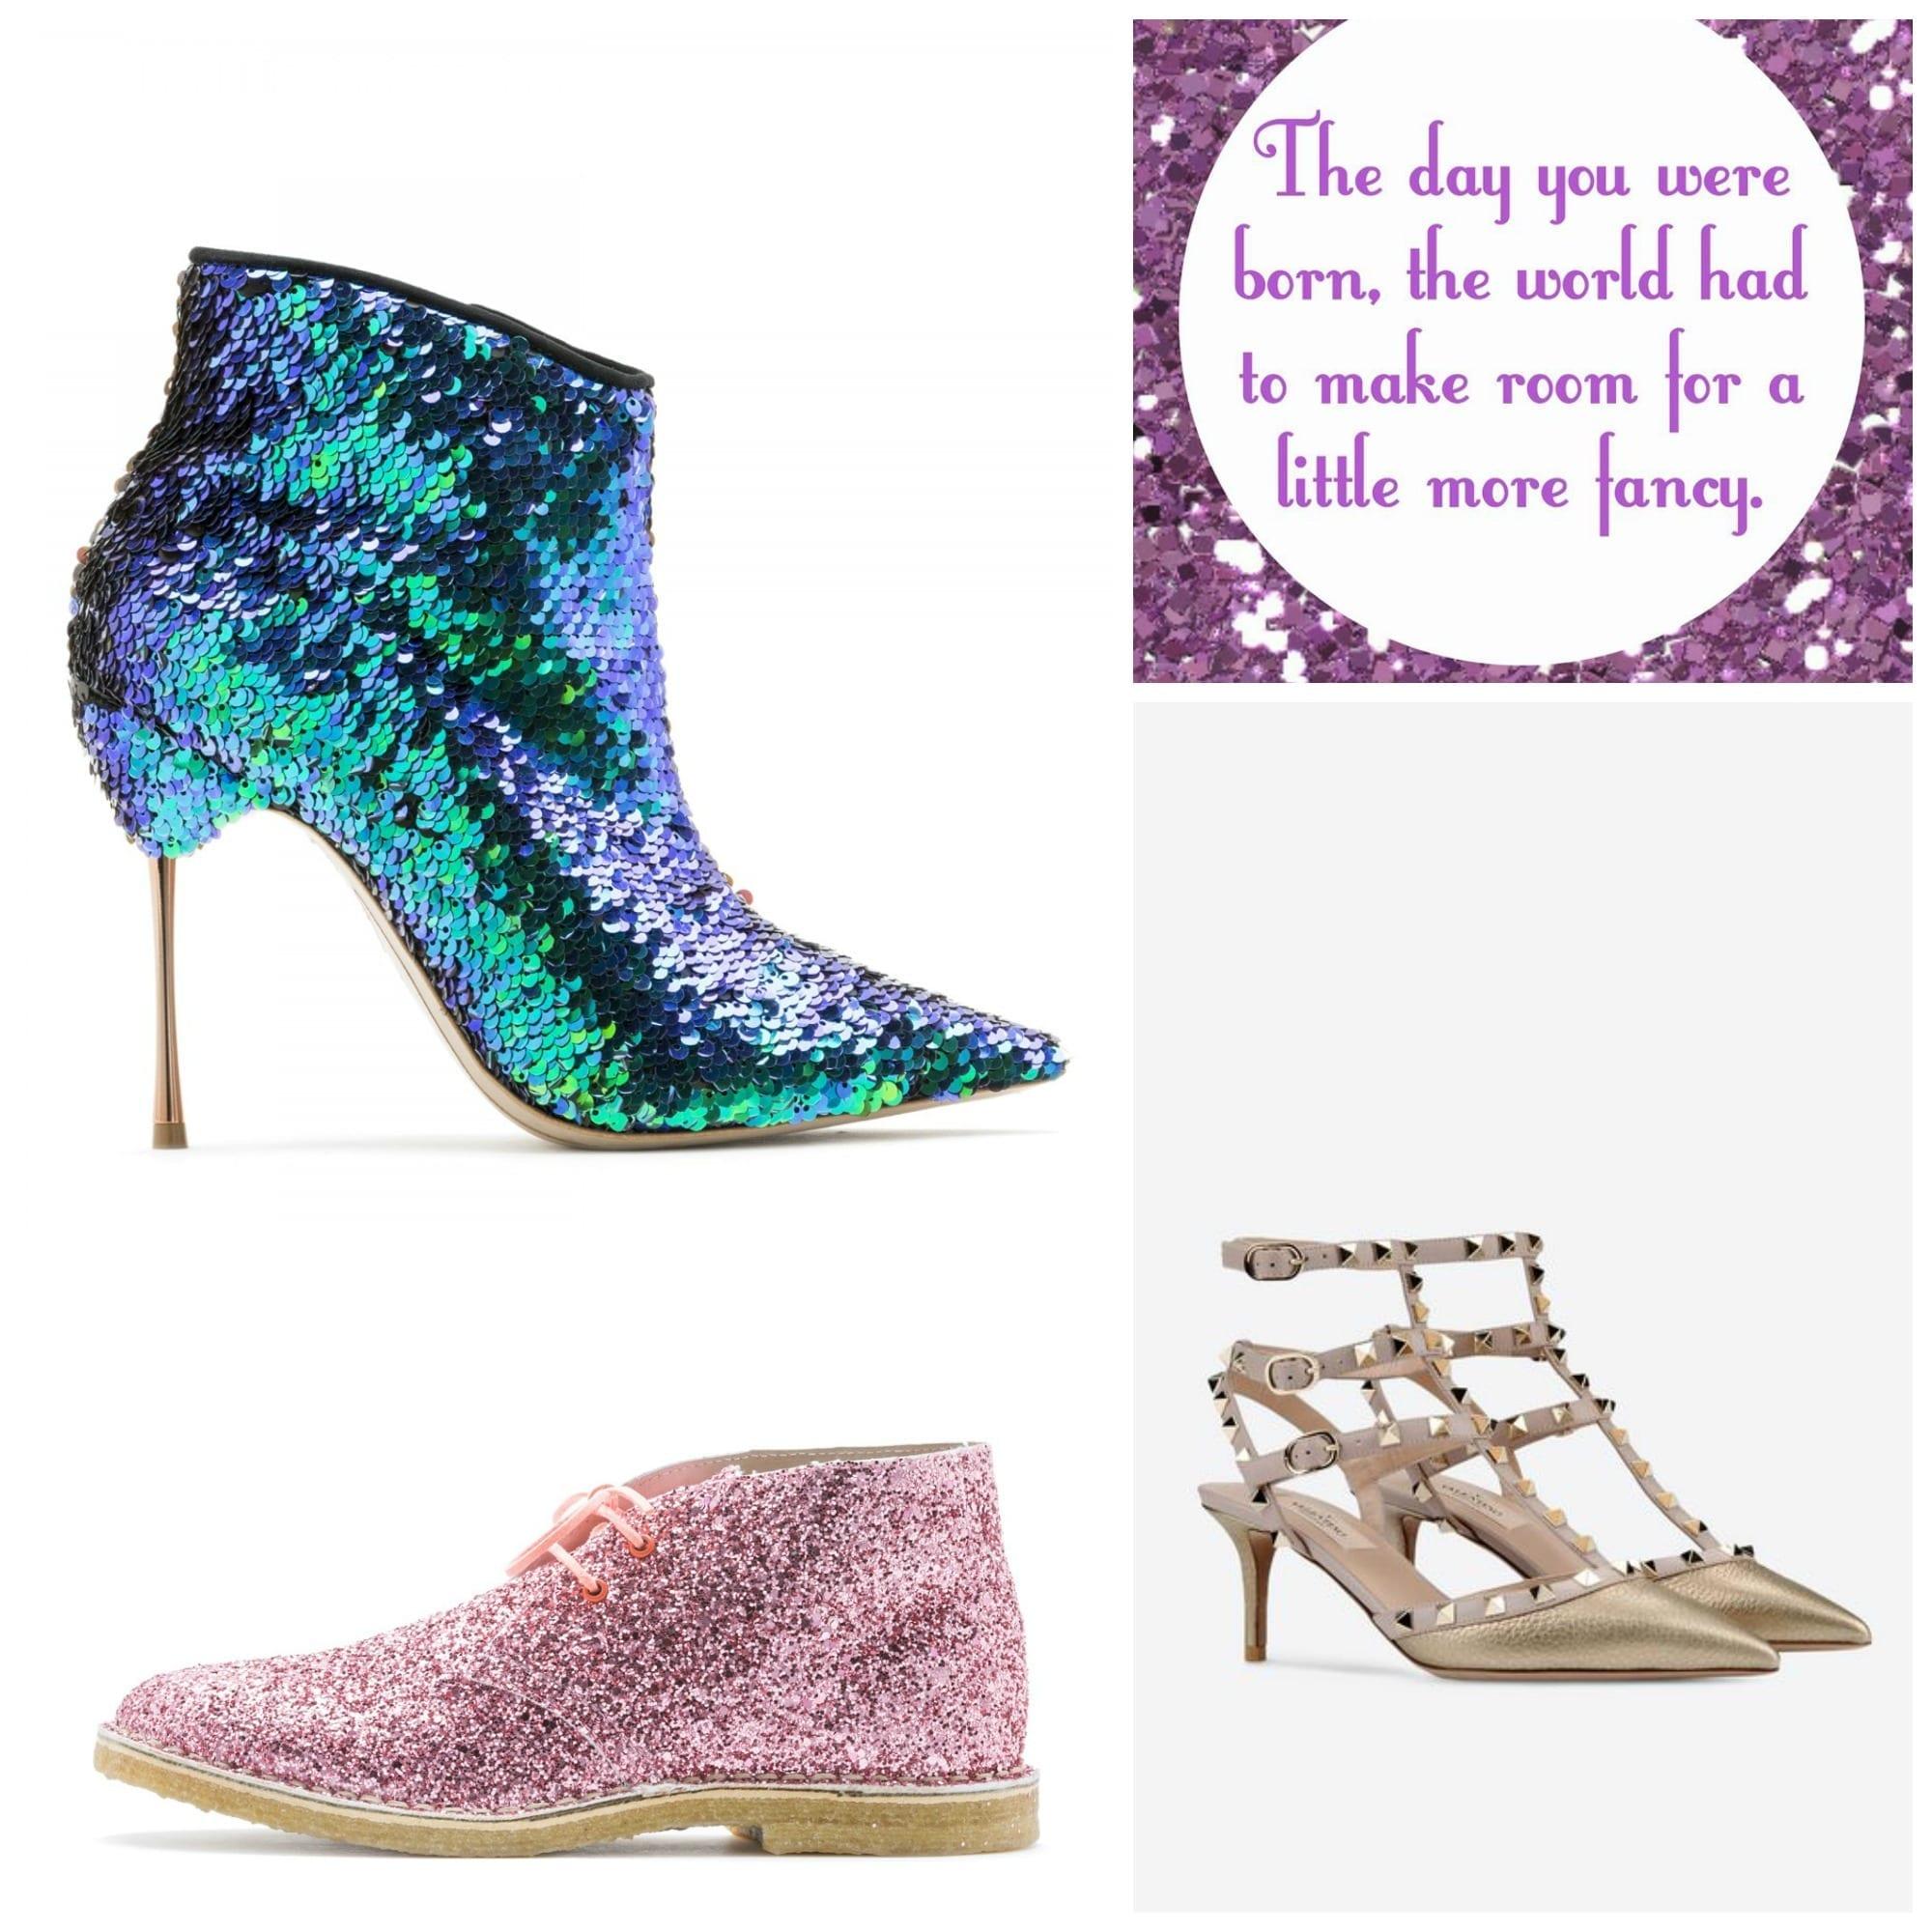 che scarpe vanno di moda, sophia webster shoes, rockstud valentino, glitter scarpe, theladycracy.it, elisa bellino